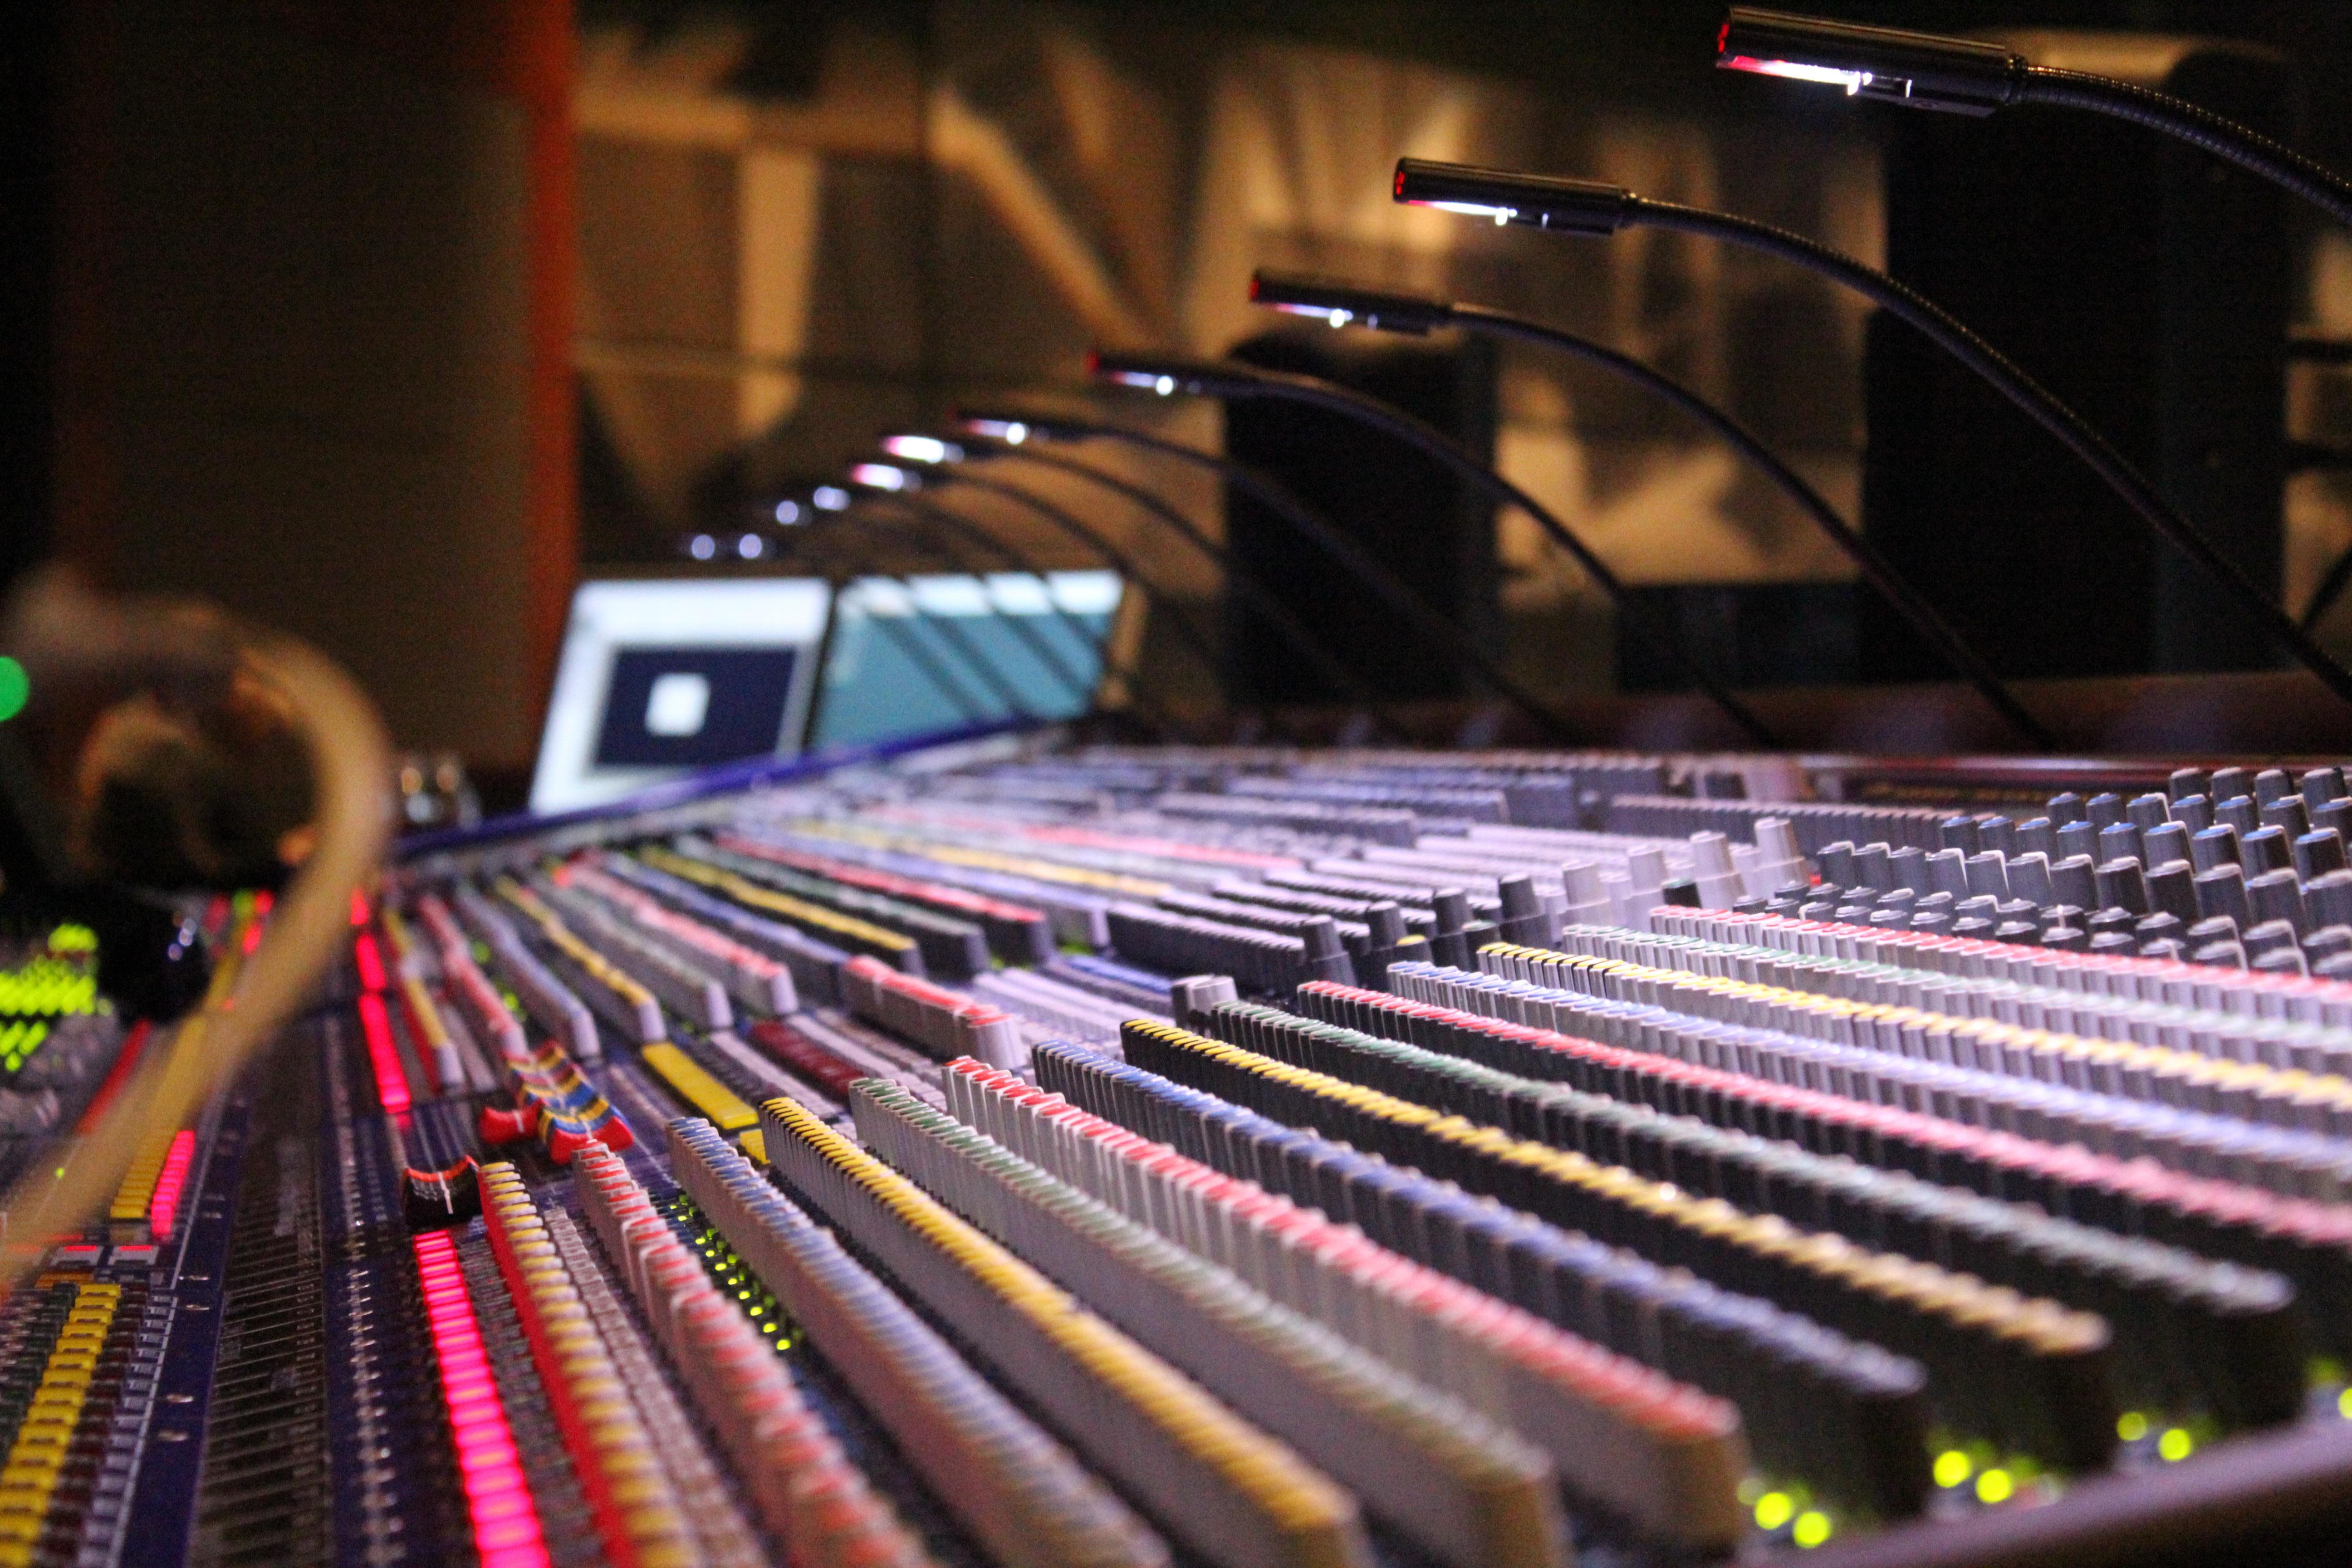 Free Images : music, equipment, studio, sound, soundboard